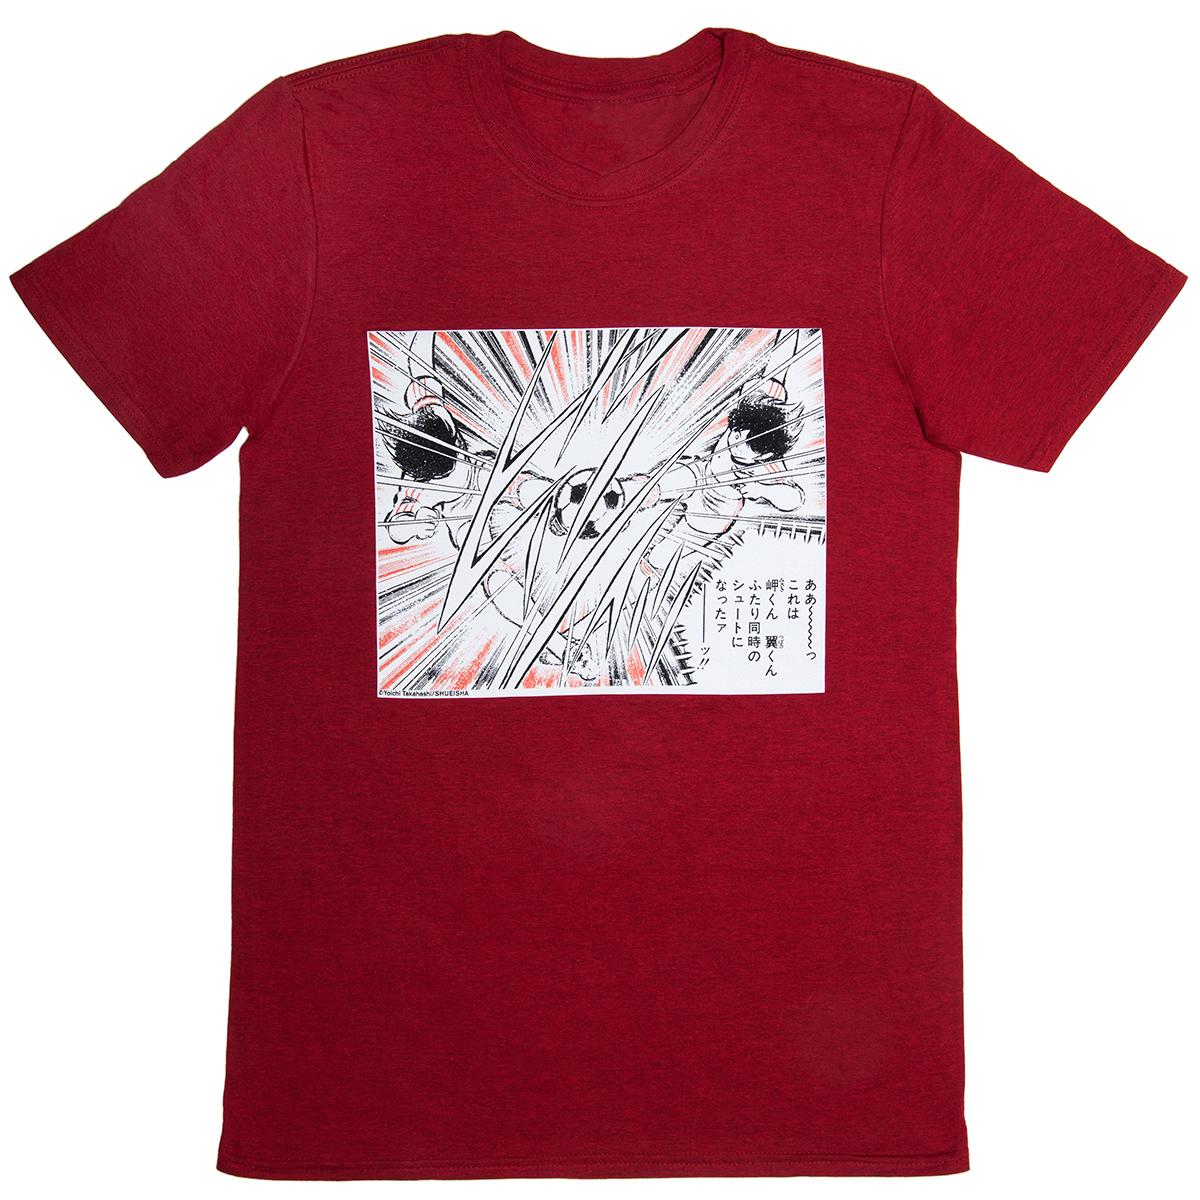 Captain Tsubasa t-shirt  (S)